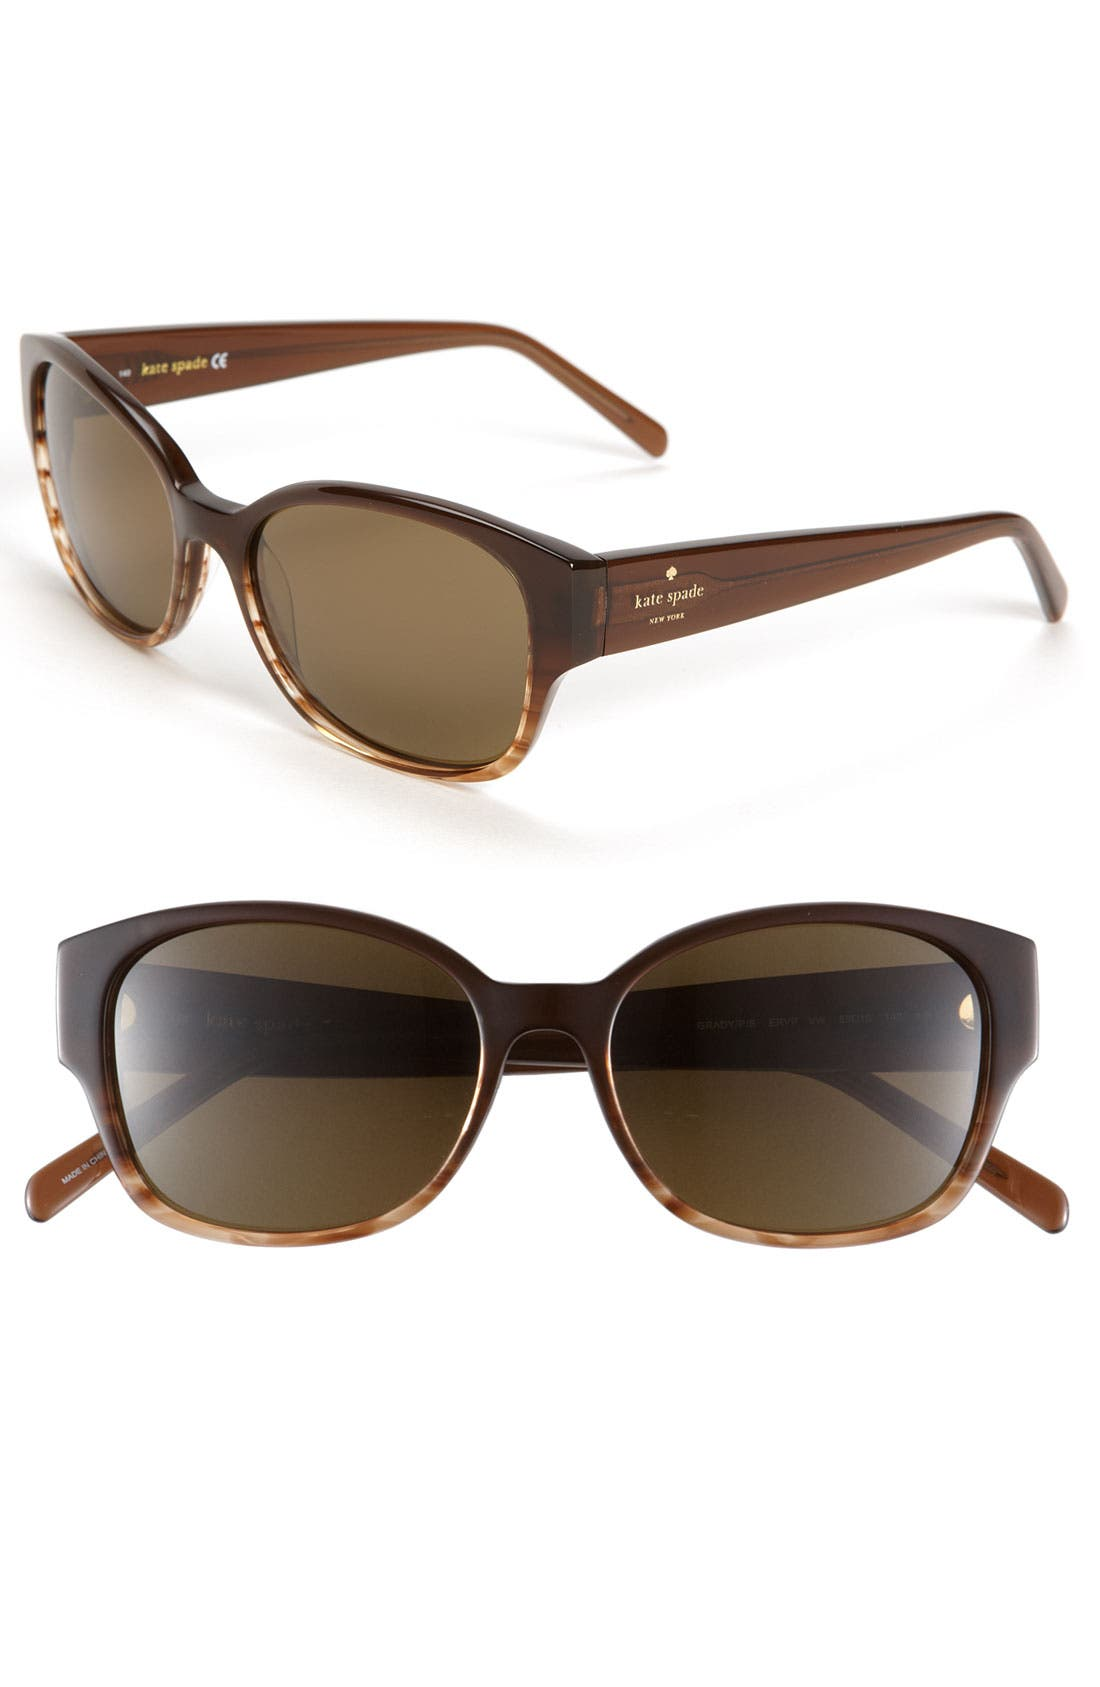 Main Image - kate spade new york polarized sunglasses